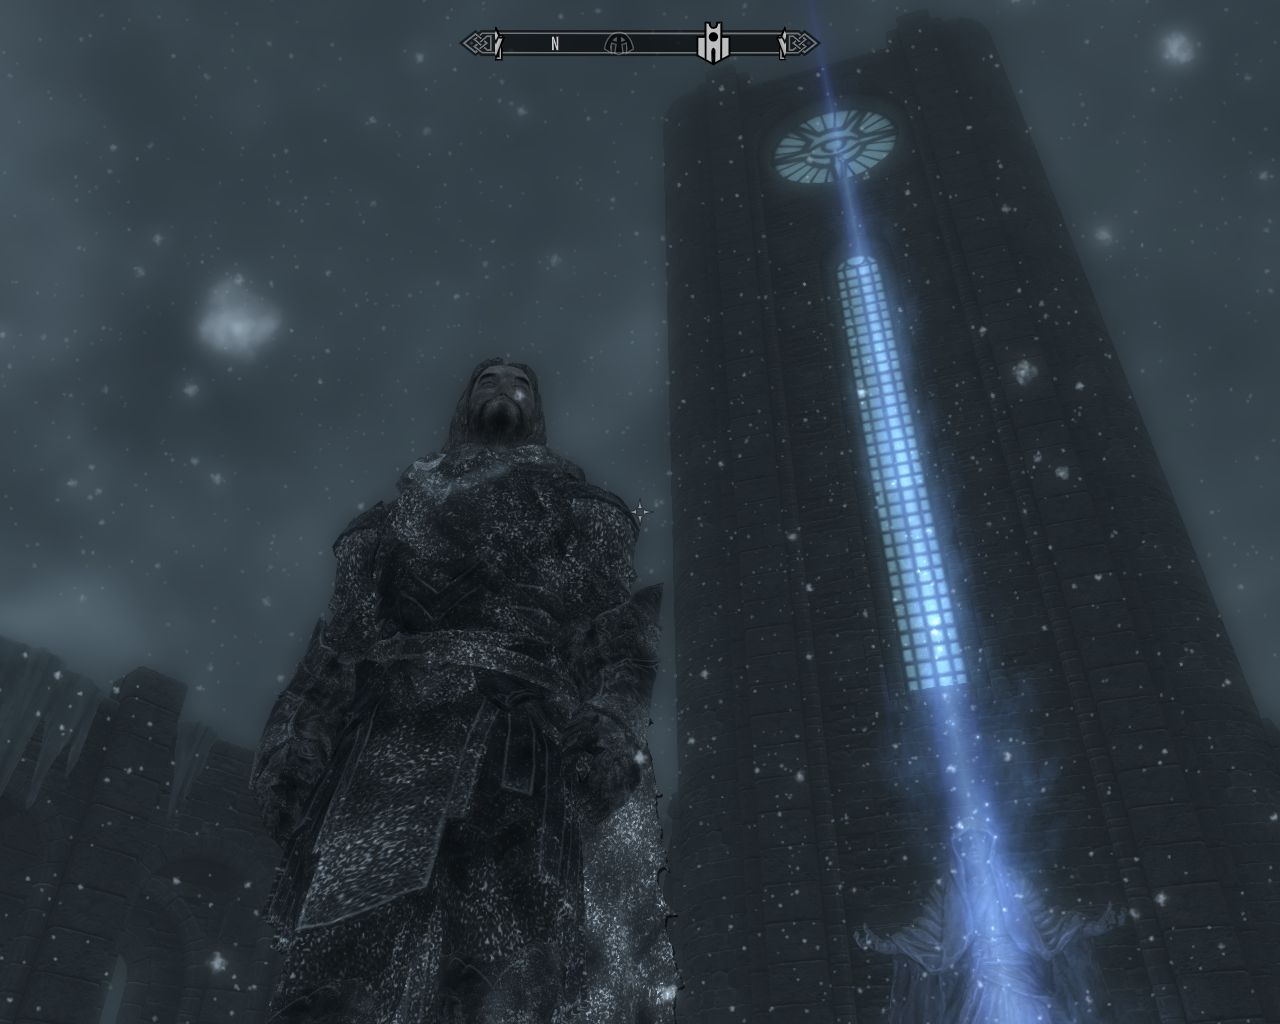 ScreenShot76.jpg - Elder Scrolls 5: Skyrim, the